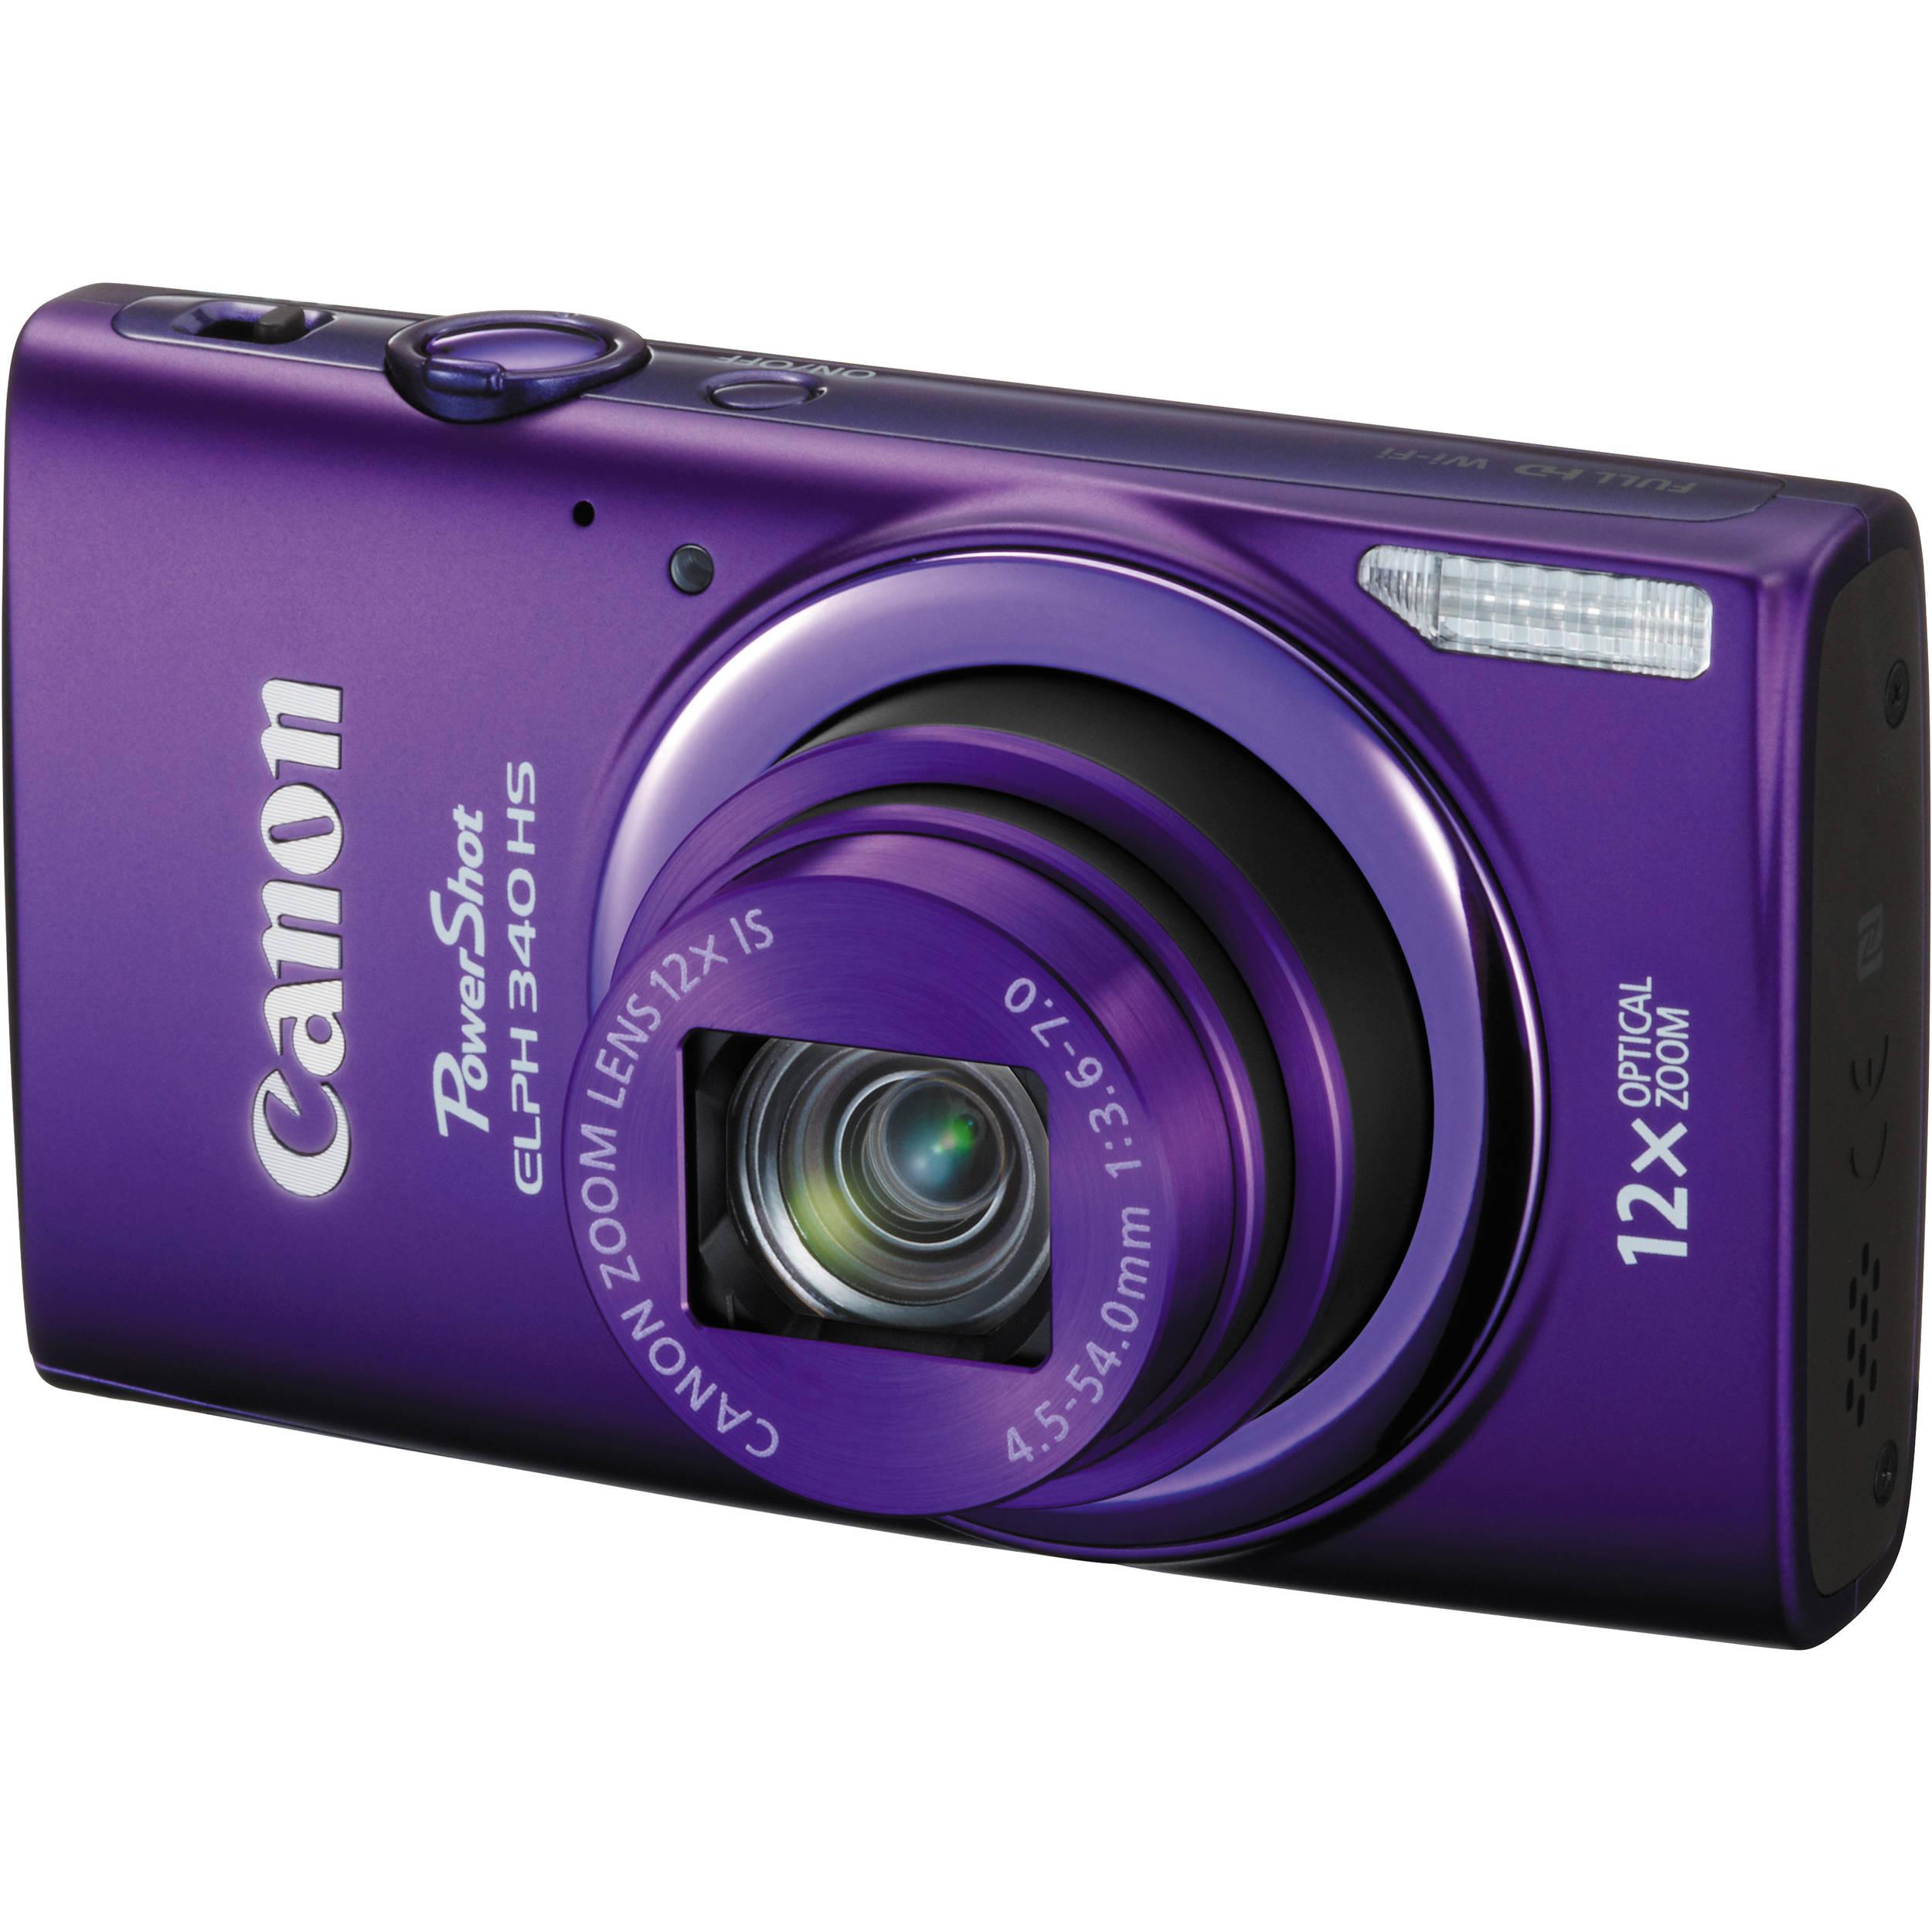 canon powershot elph 340 hs digital camera purple 9350b001 b h rh bhphotovideo com canon powershot elph 340 hs manual pdf Canon PowerShot N110